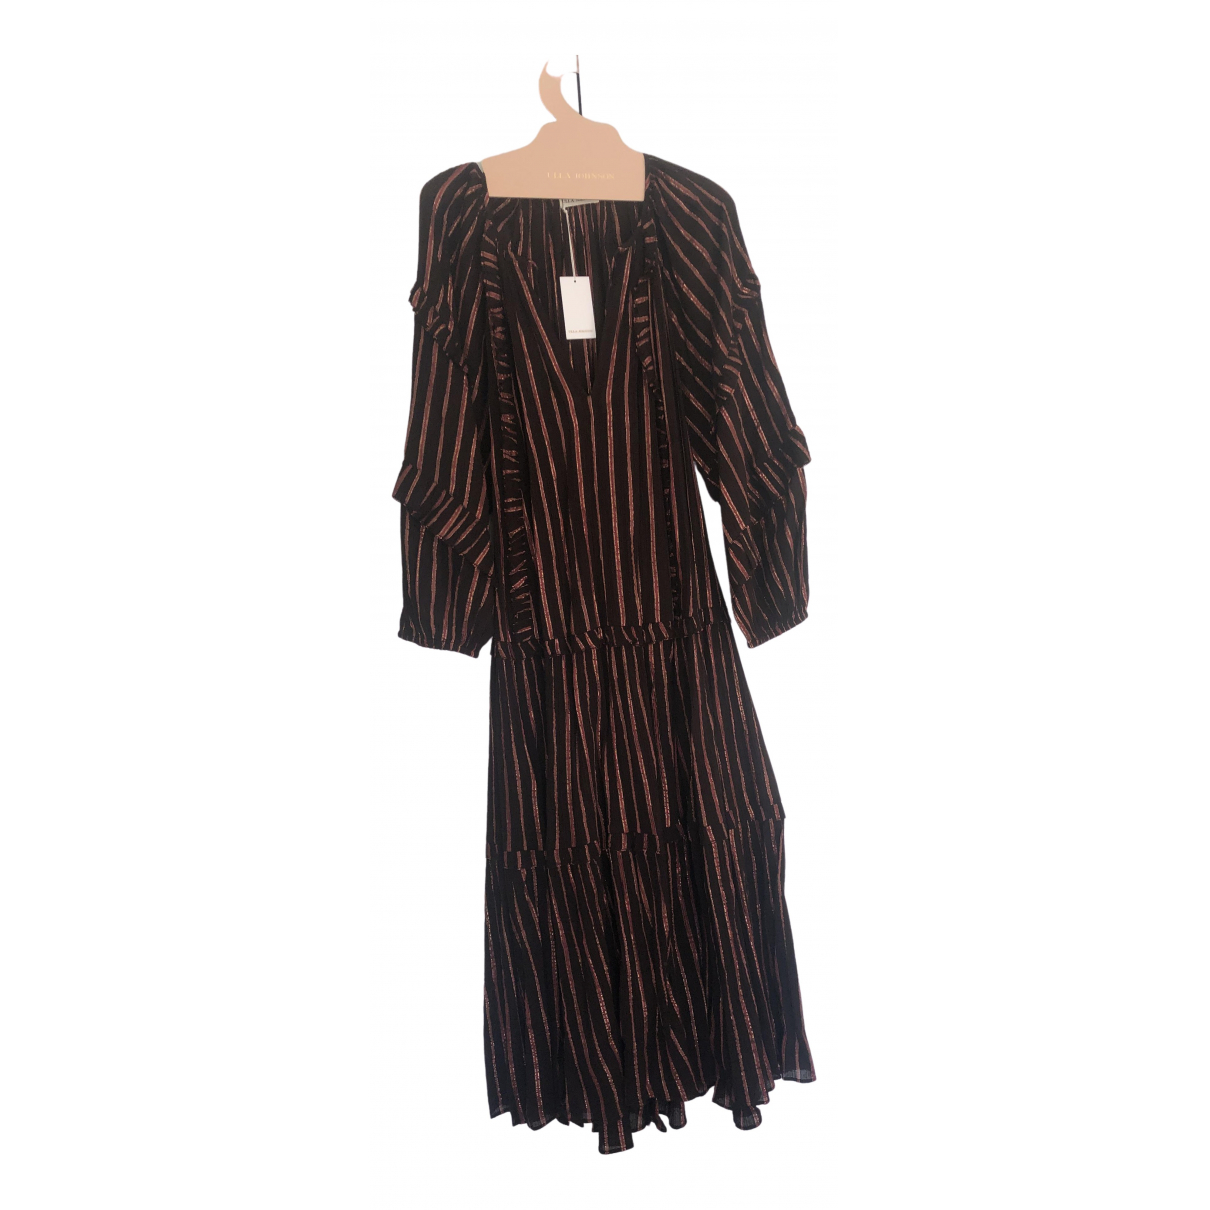 Ulla Johnson \N Brown Cotton - elasthane dress for Women 4 US